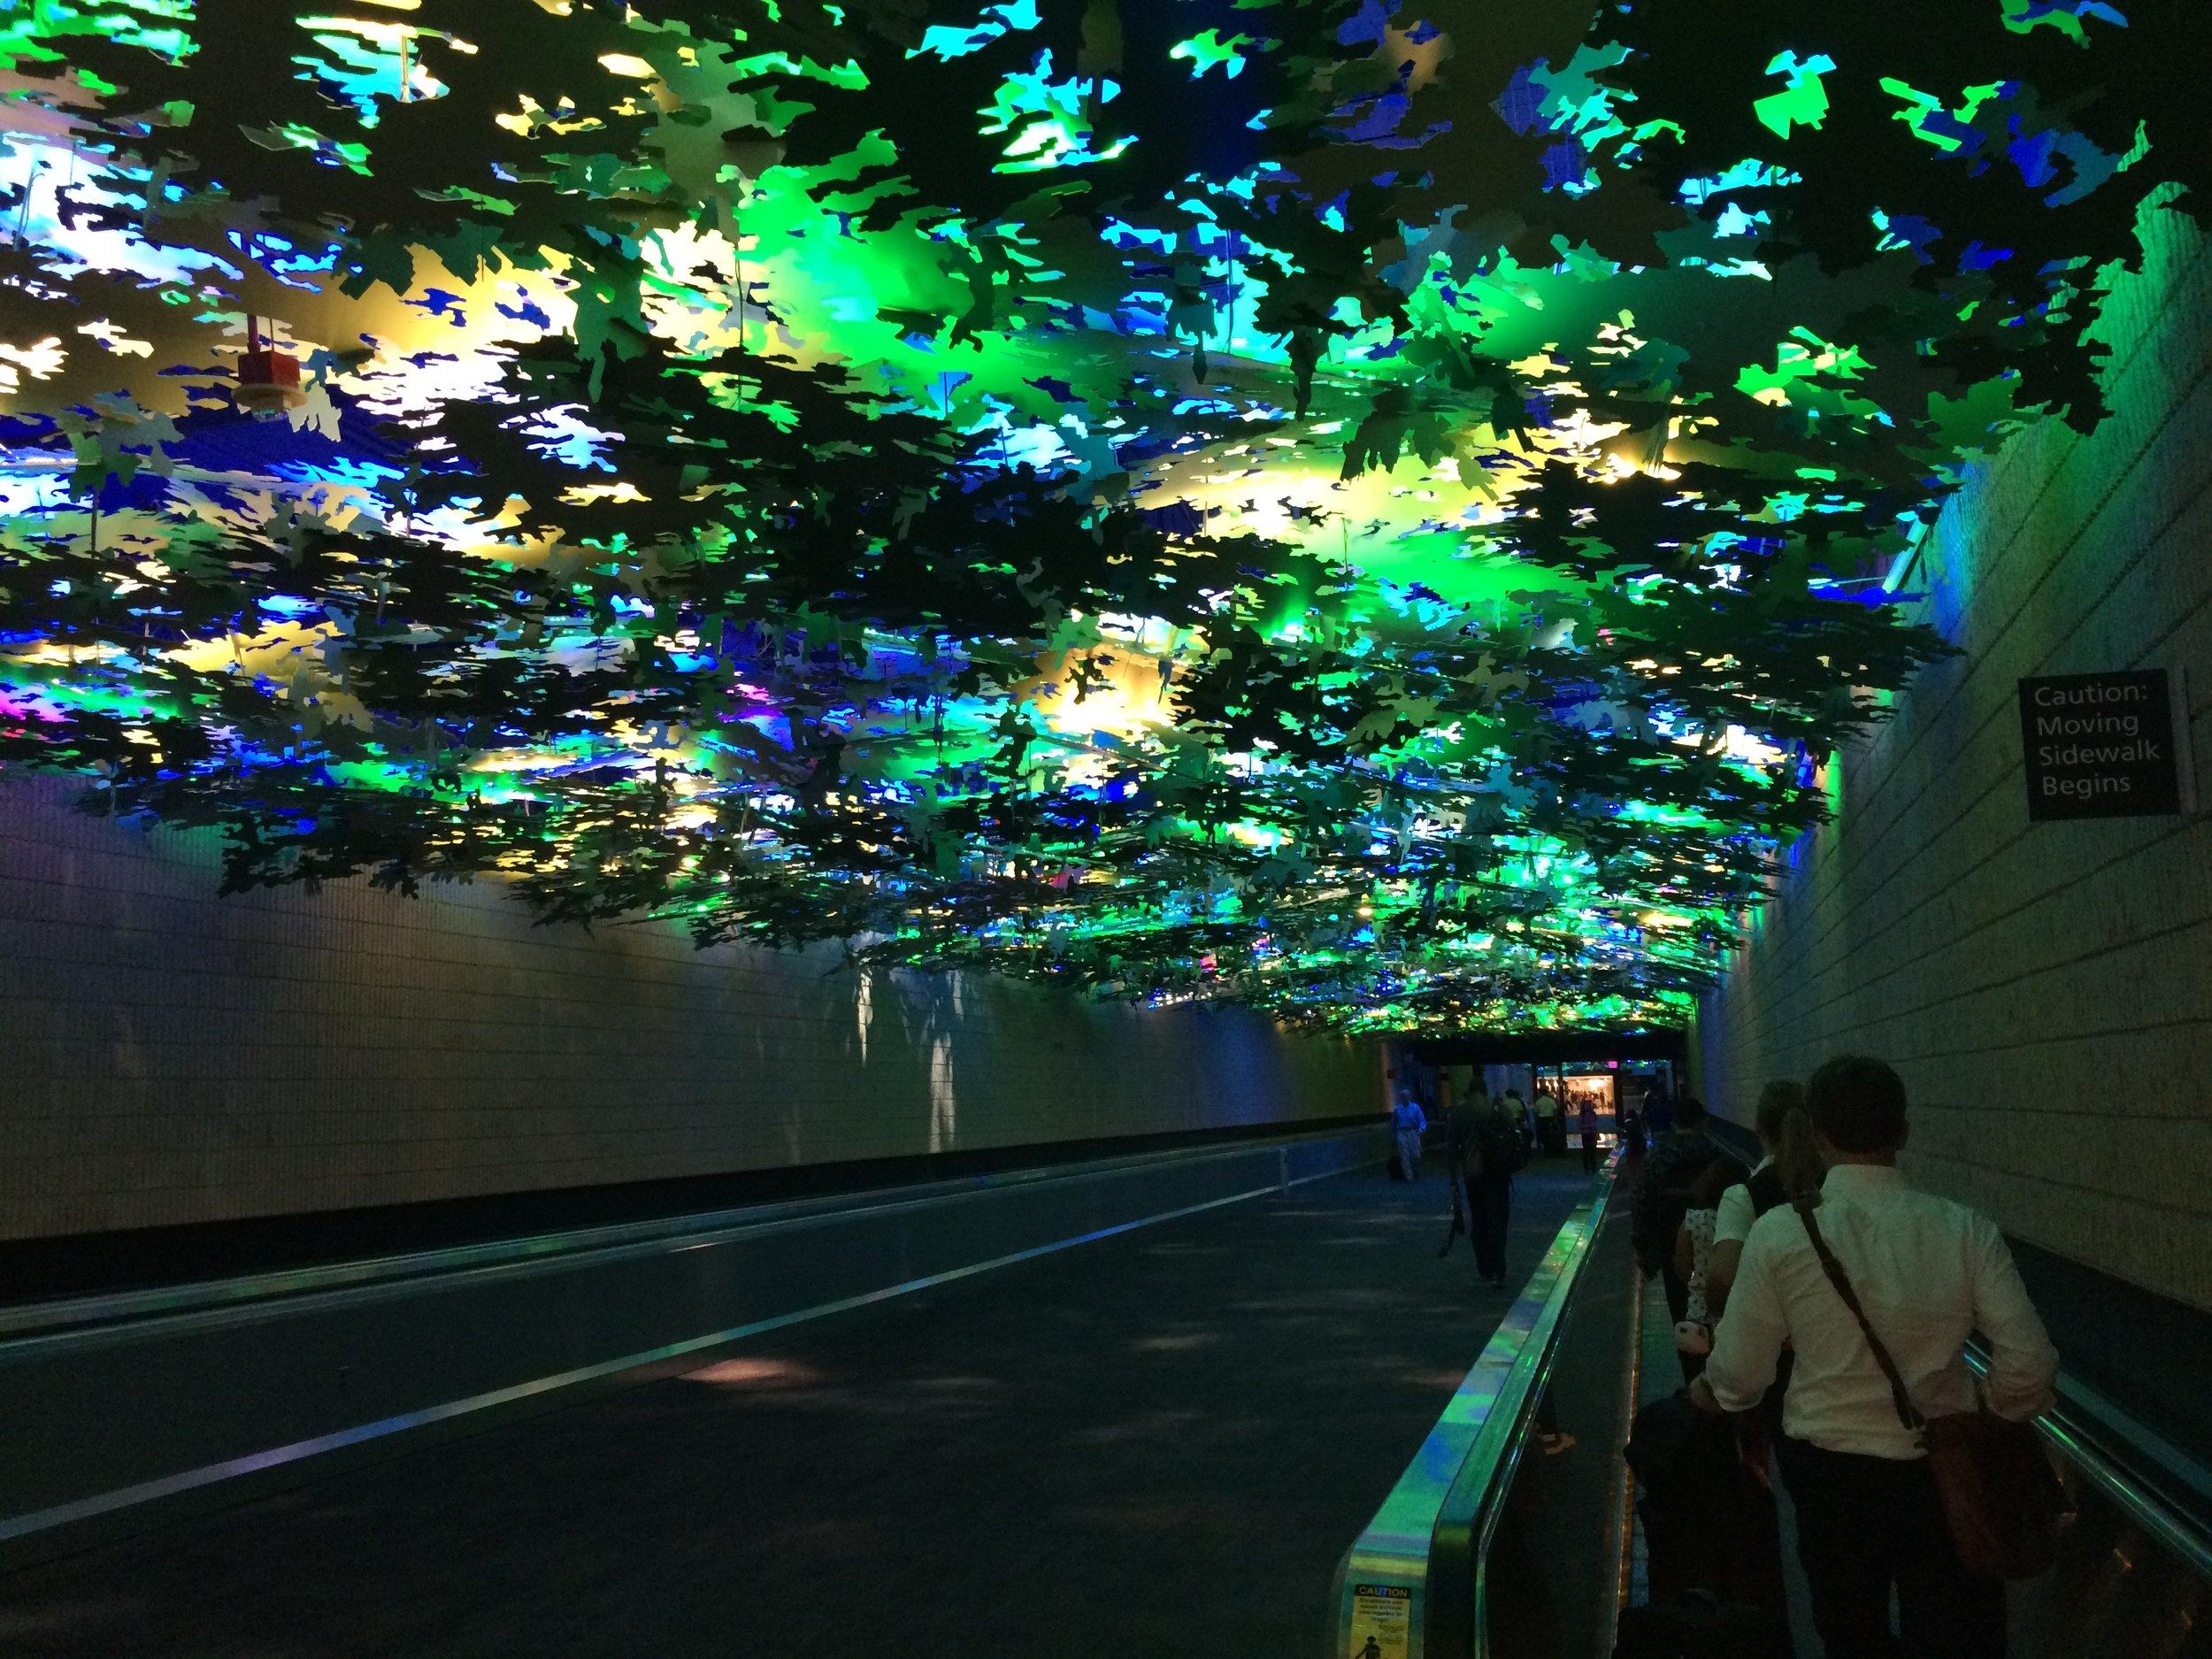 Art installation over people mover at Hartfield-Jackson Atlanta Airport